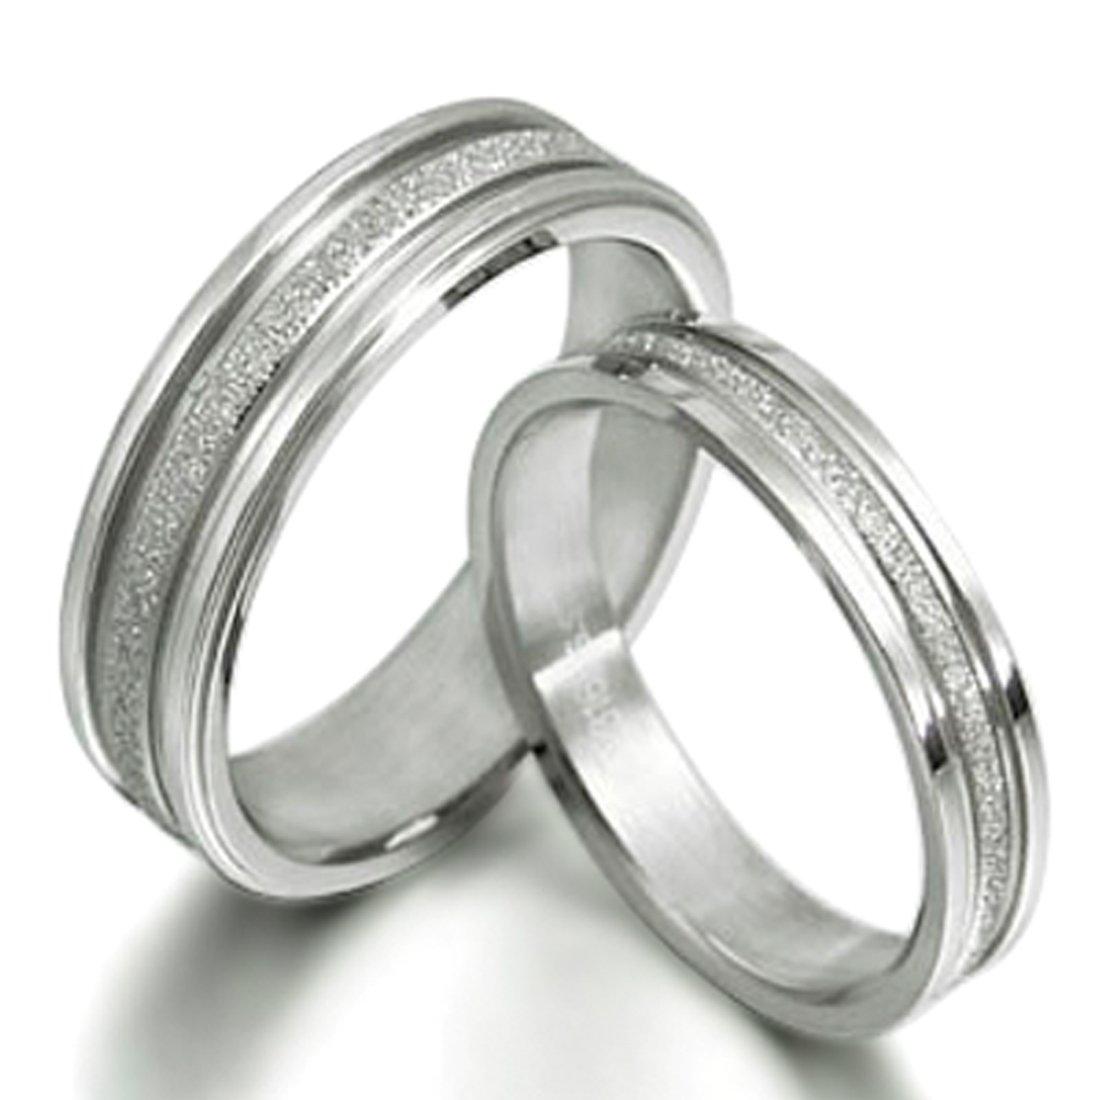 Gemini Groom /& Bride Matching Couple Titanium Wedding Engagement Rings Set 6mm /& 4mm Width Men Ring Size 8.5 Women Ring Size 6.5